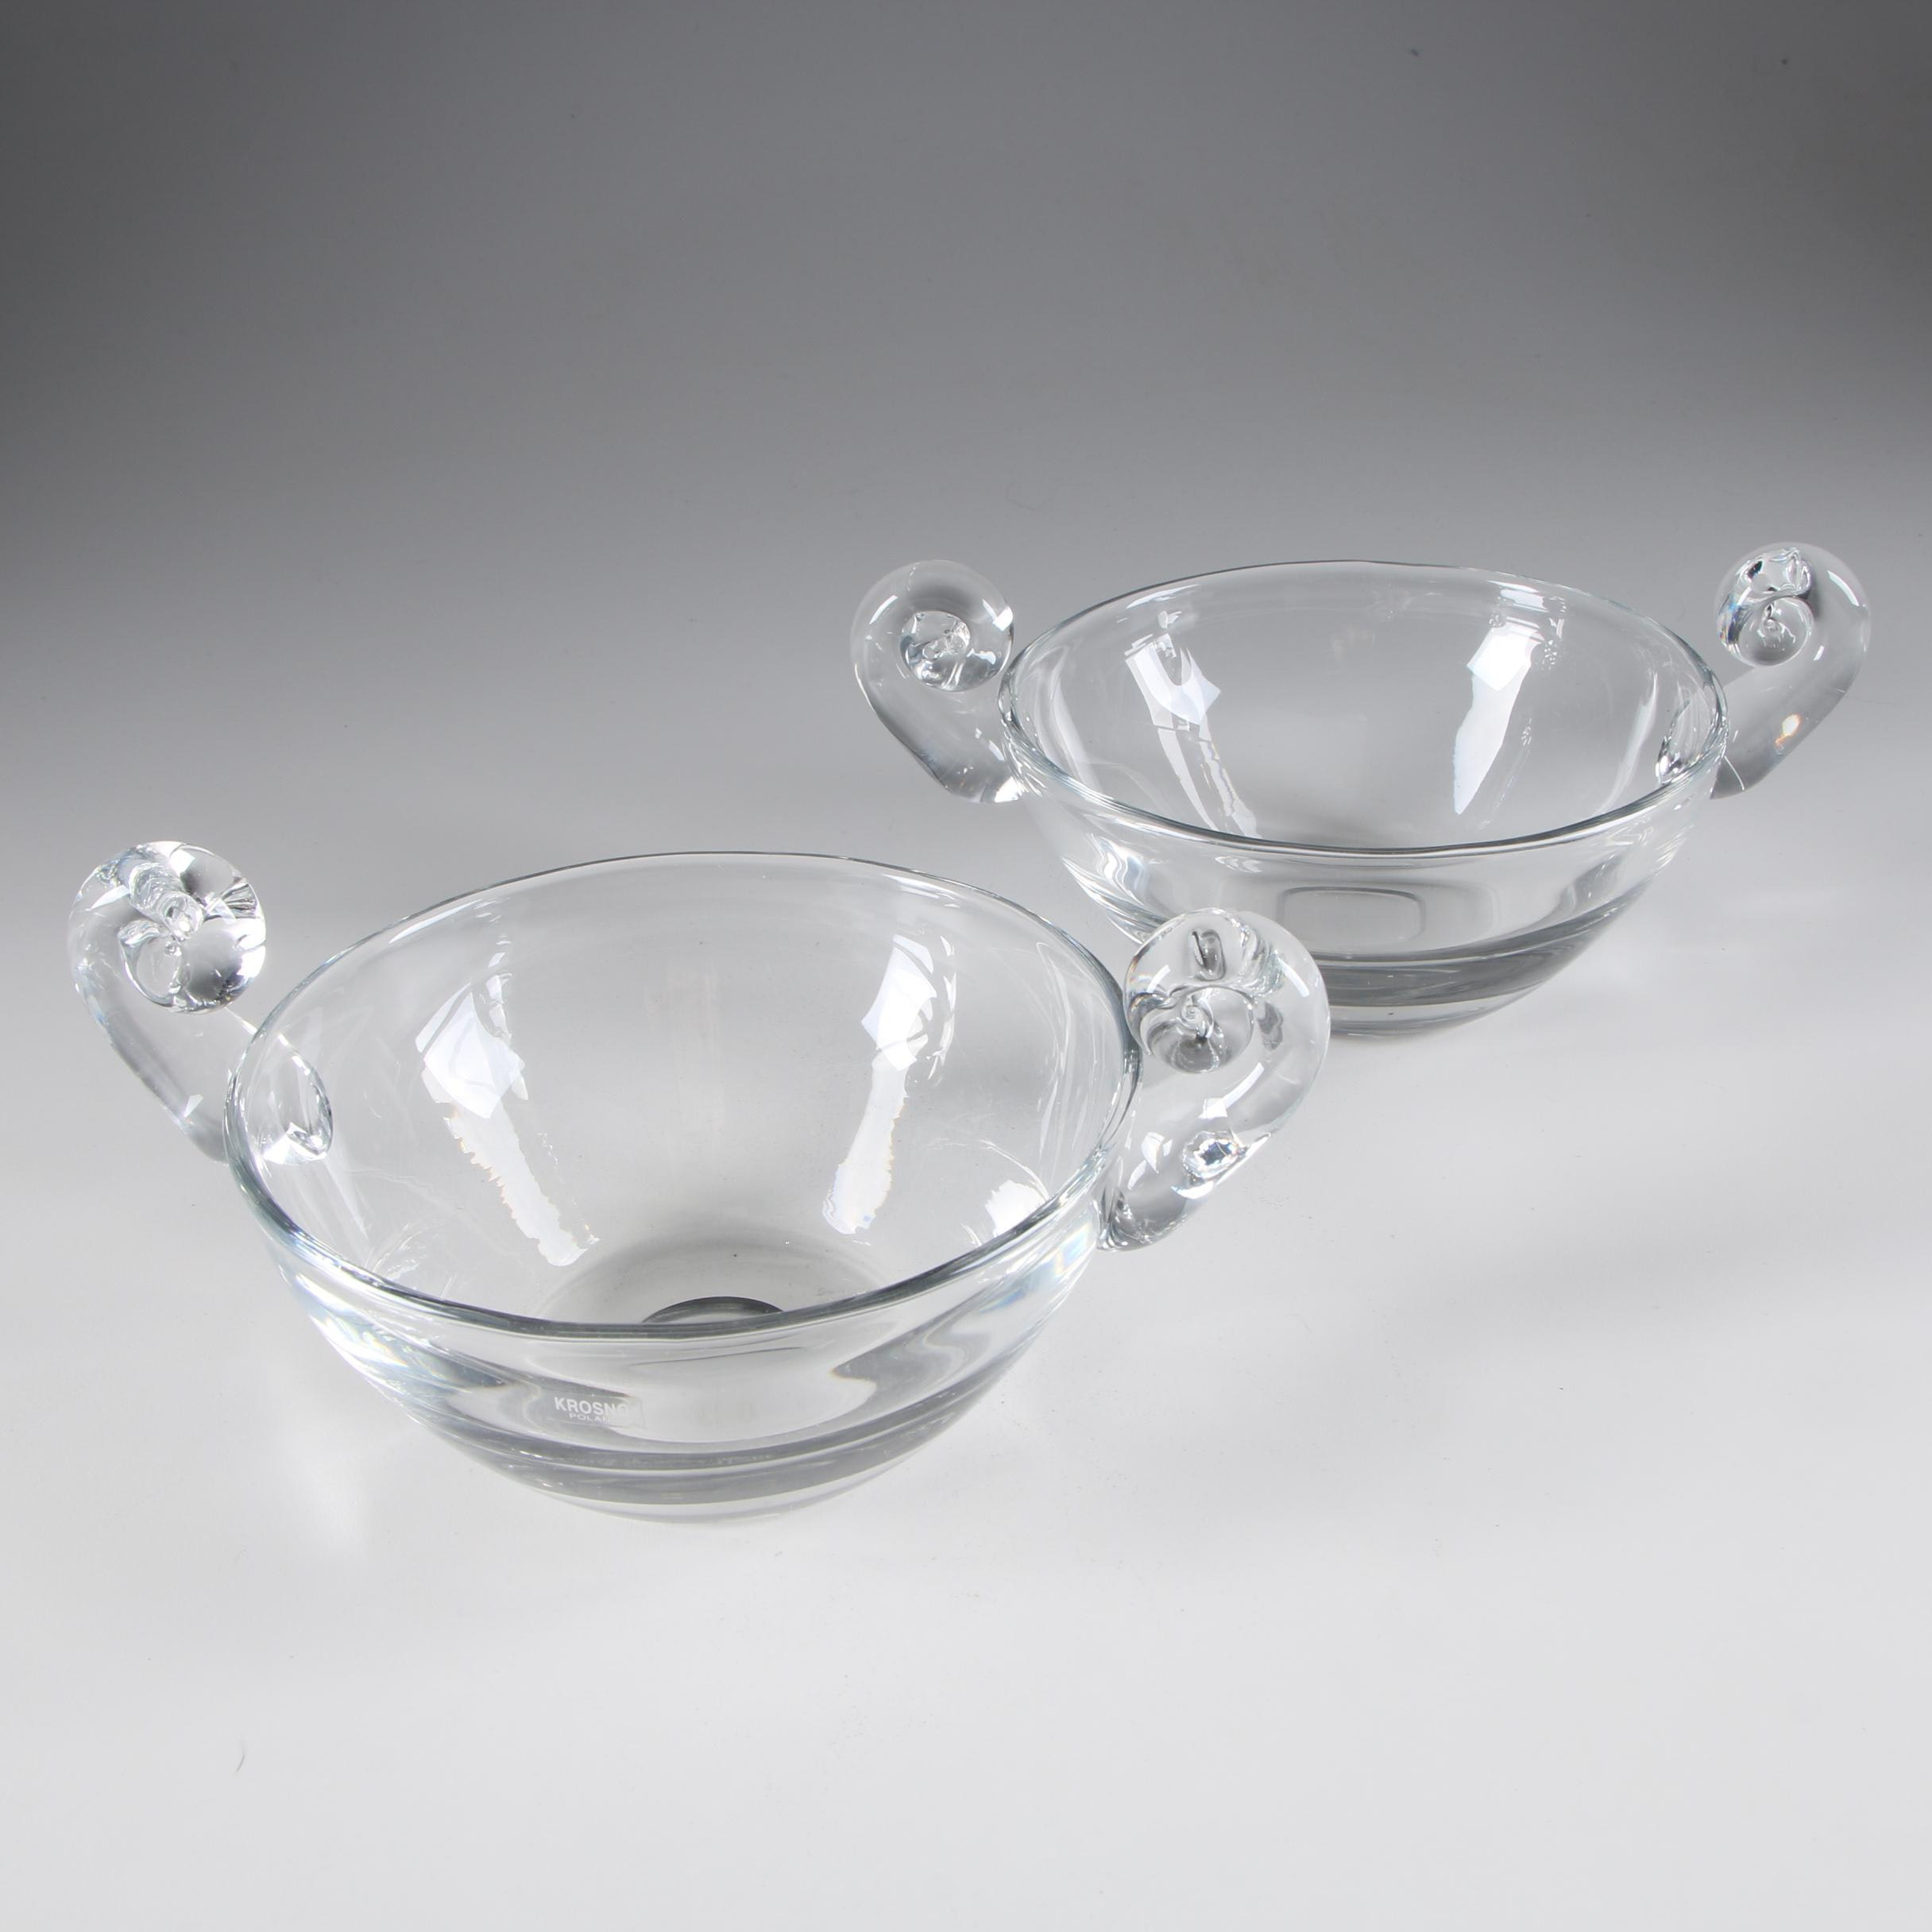 Polish Krosno Art Glass Bowls with Scroll Handles